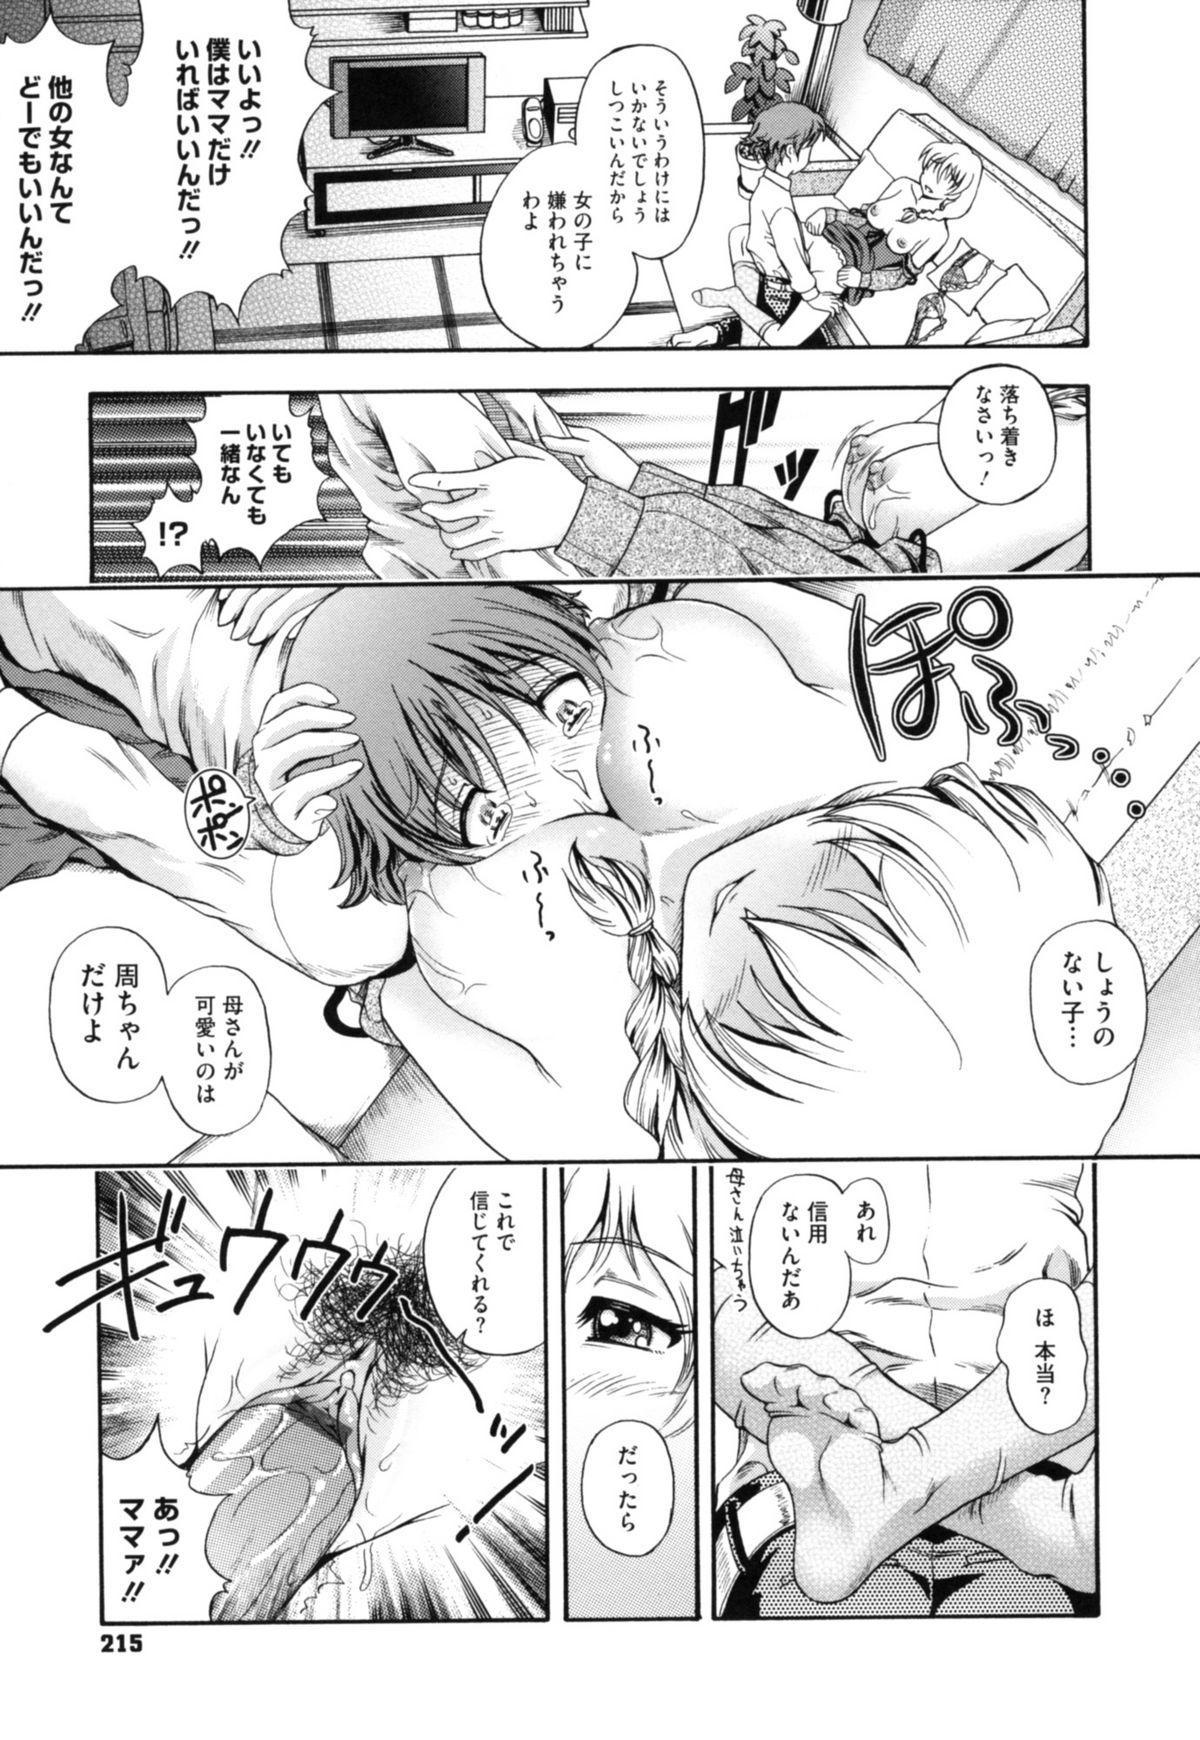 Soushisouai Note Nisatsume 224